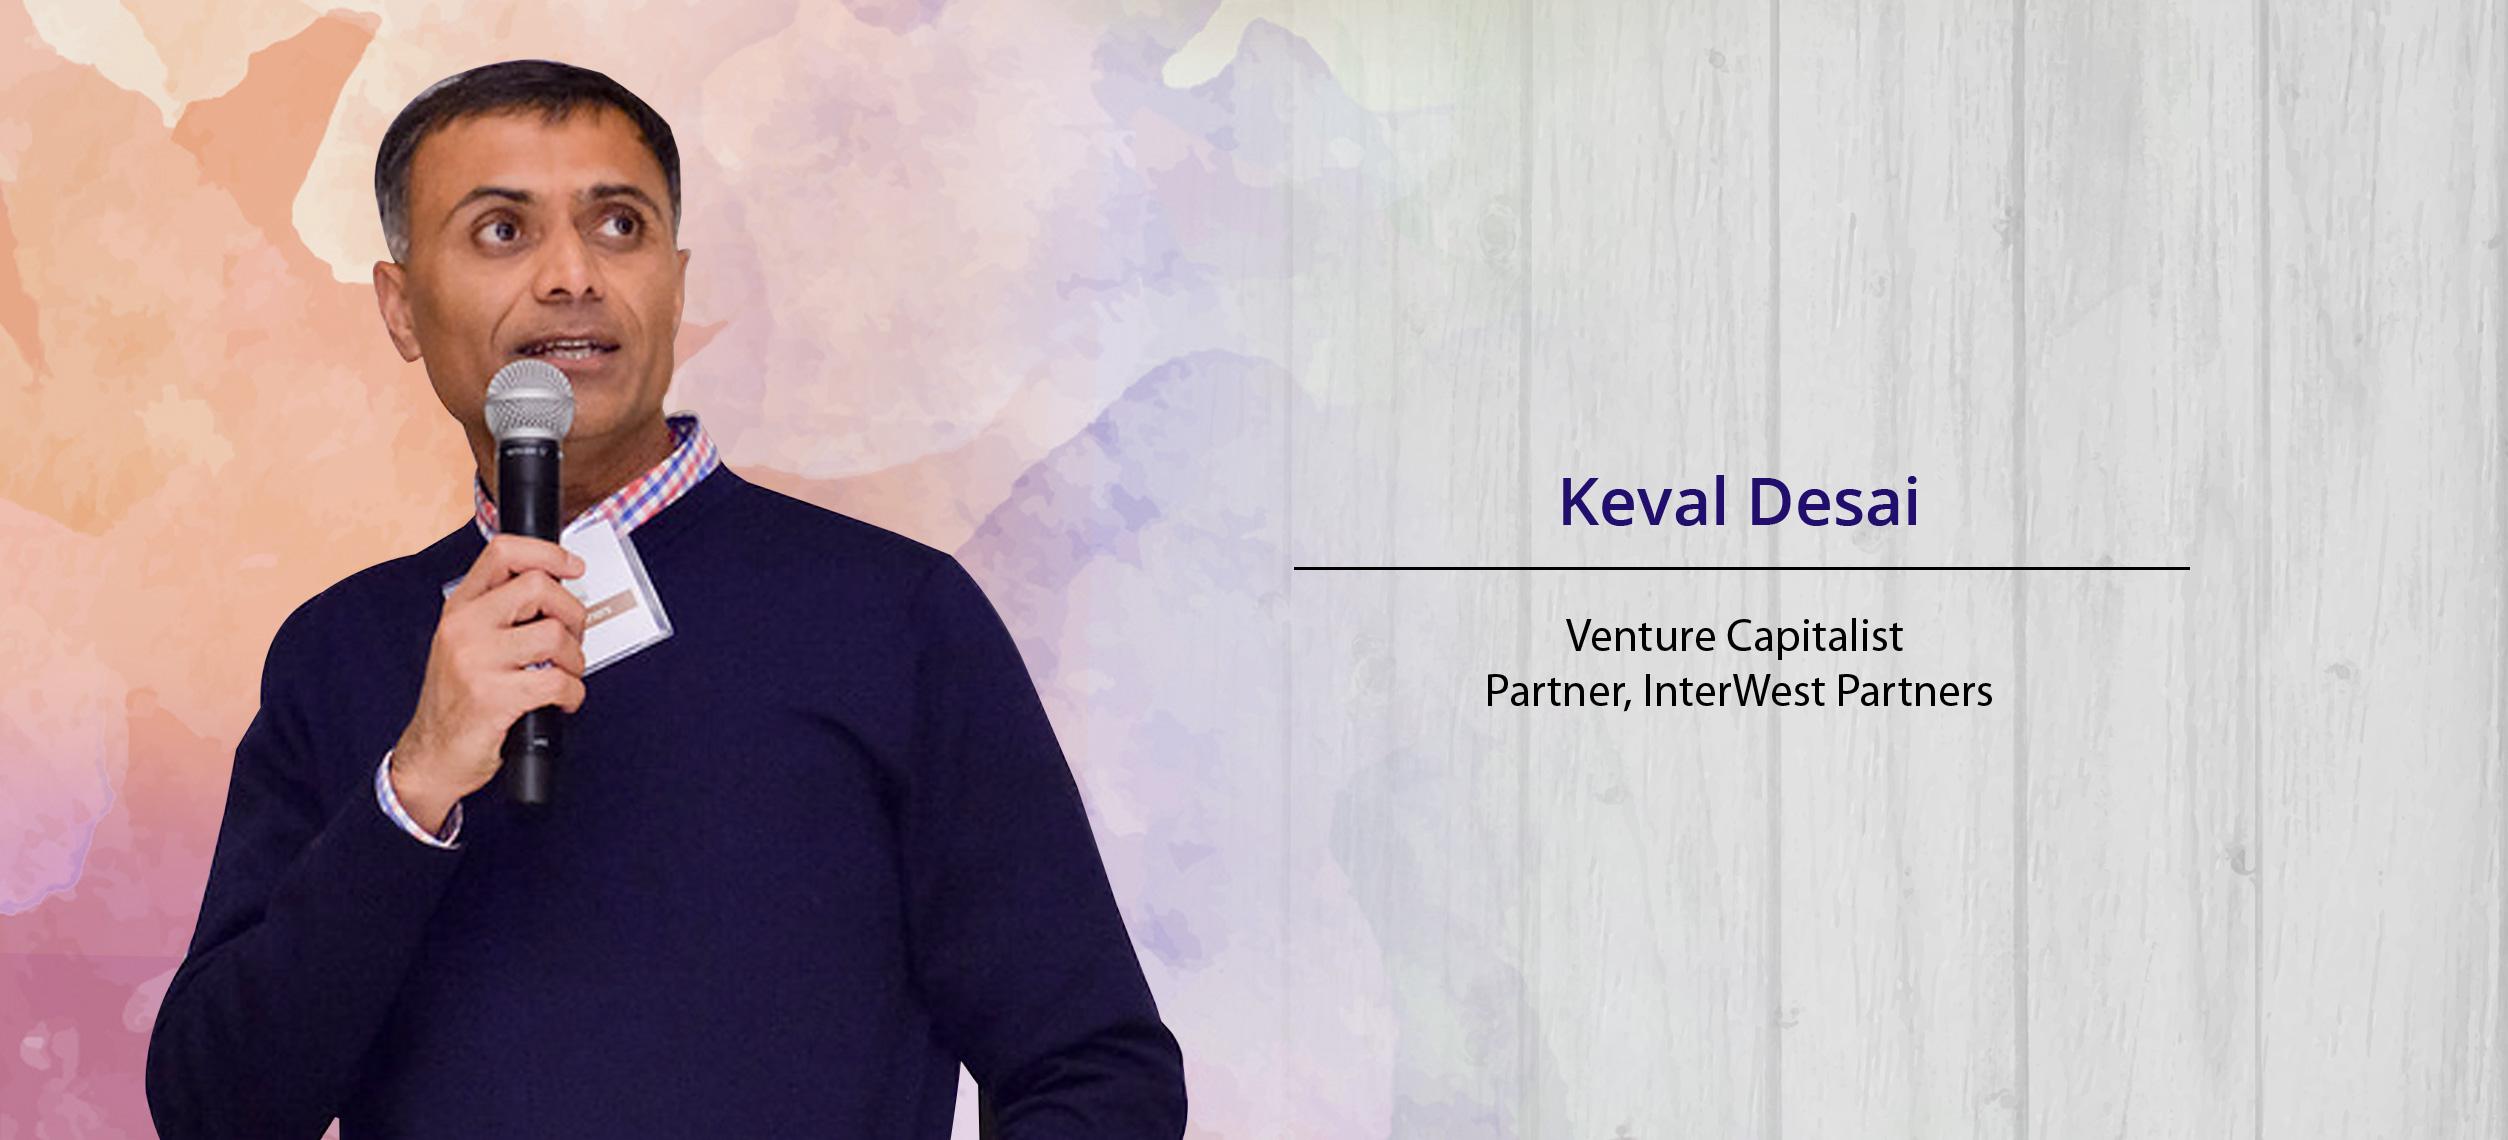 Keval-desai-venture-capitalist